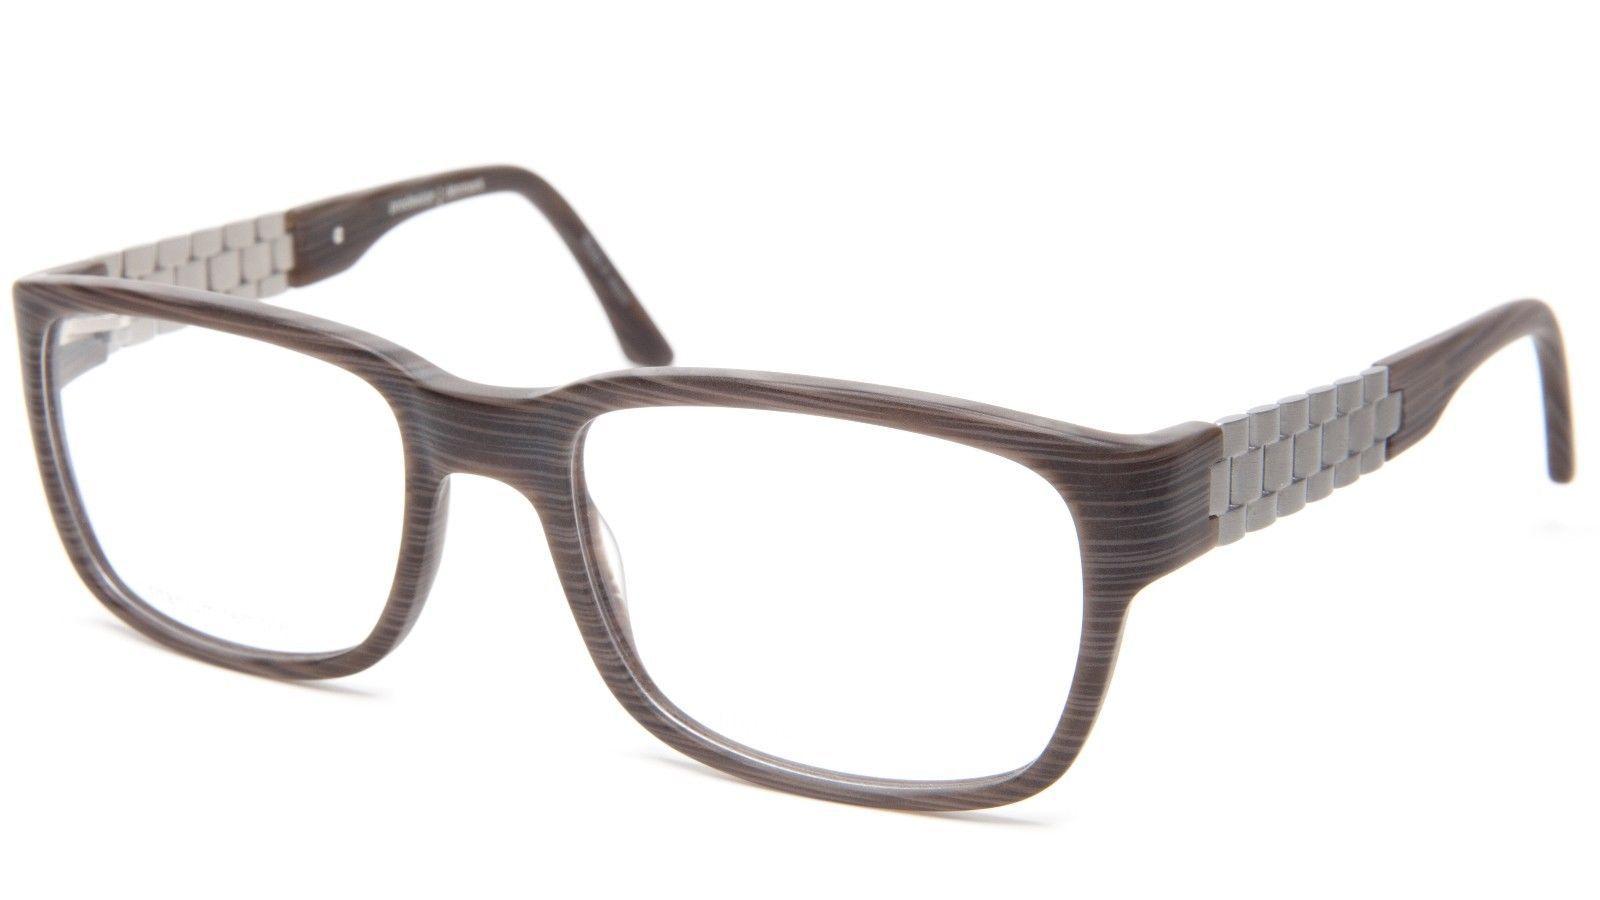 17fc1bbdc0c New Prodesign Denmark 7631 1 c.6531 Grey and 50 similar items